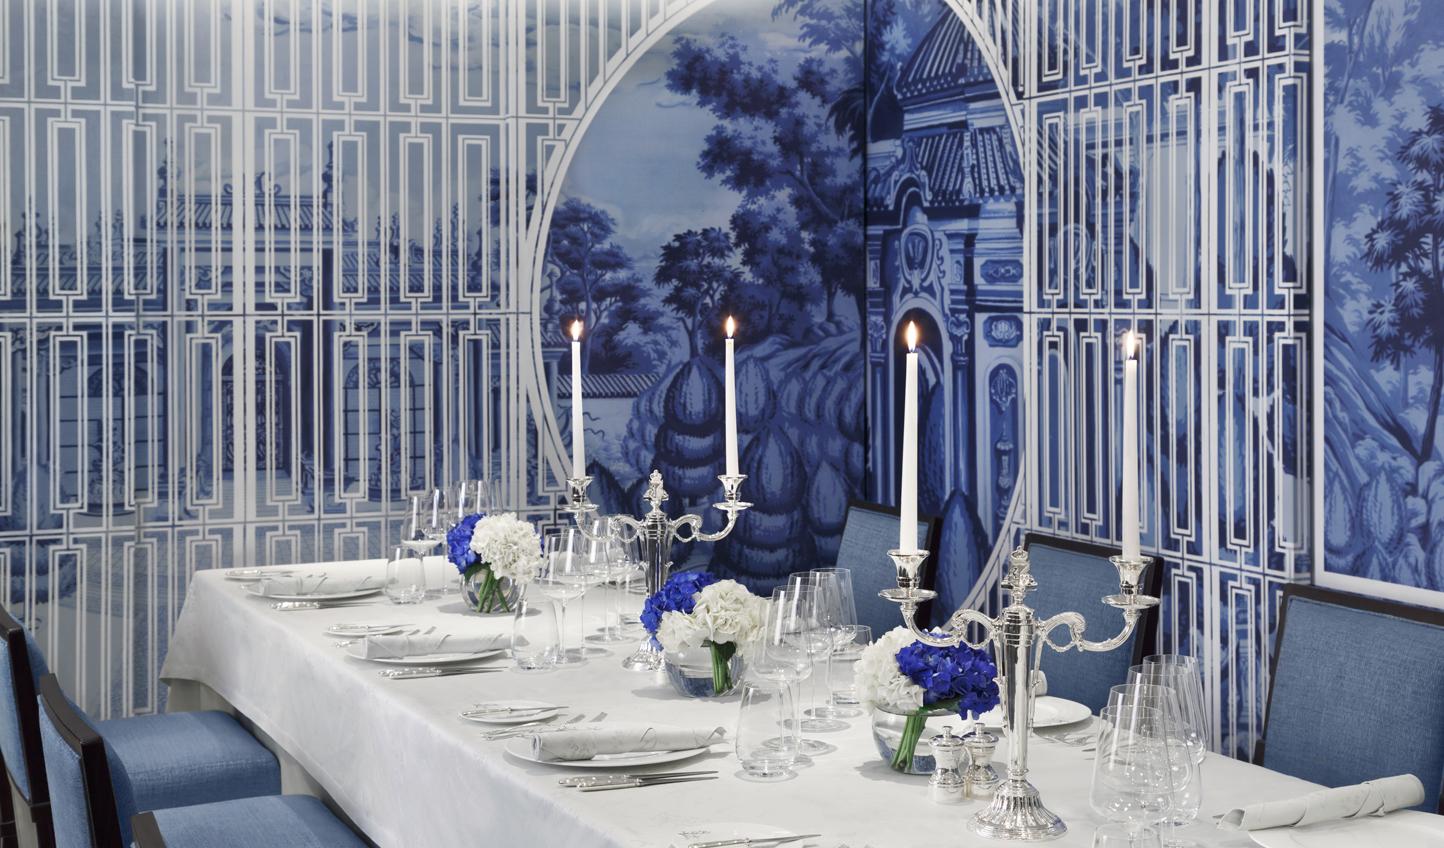 Elegant decor highlighting Chinese heritage